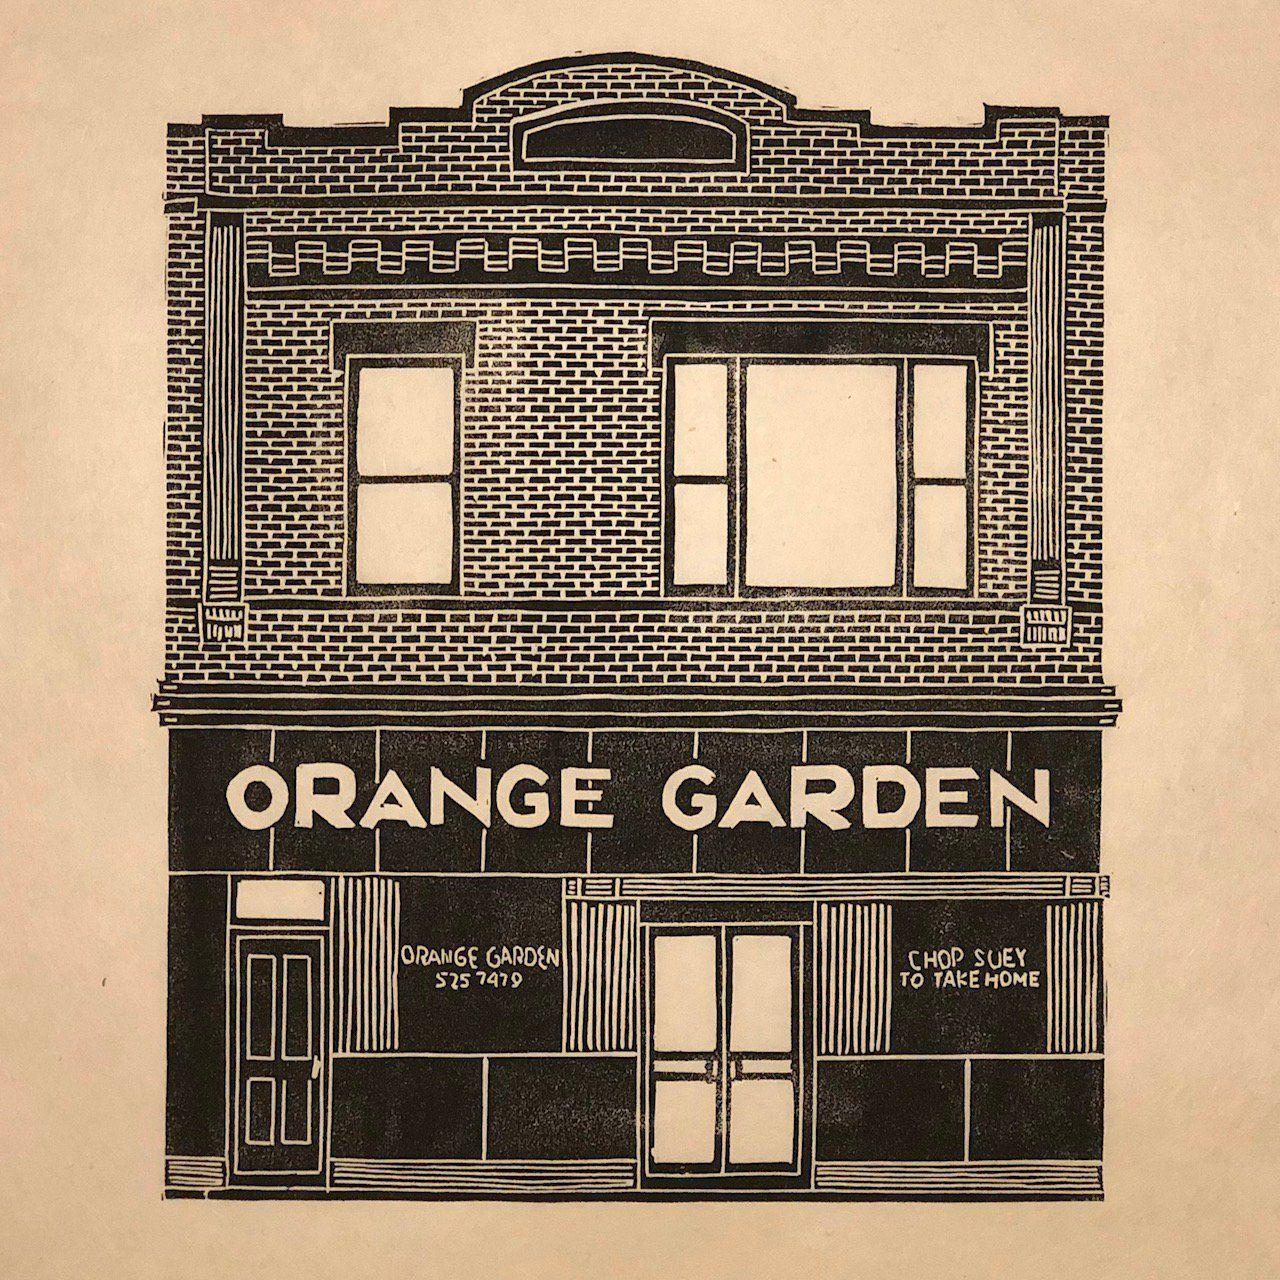 Preservation Chicago Pres Chicago Twitter Orange Garden On Irving Park Near Lincoln Damen Probably Chicago S Olde House Illustration Chicago Art Art Deco